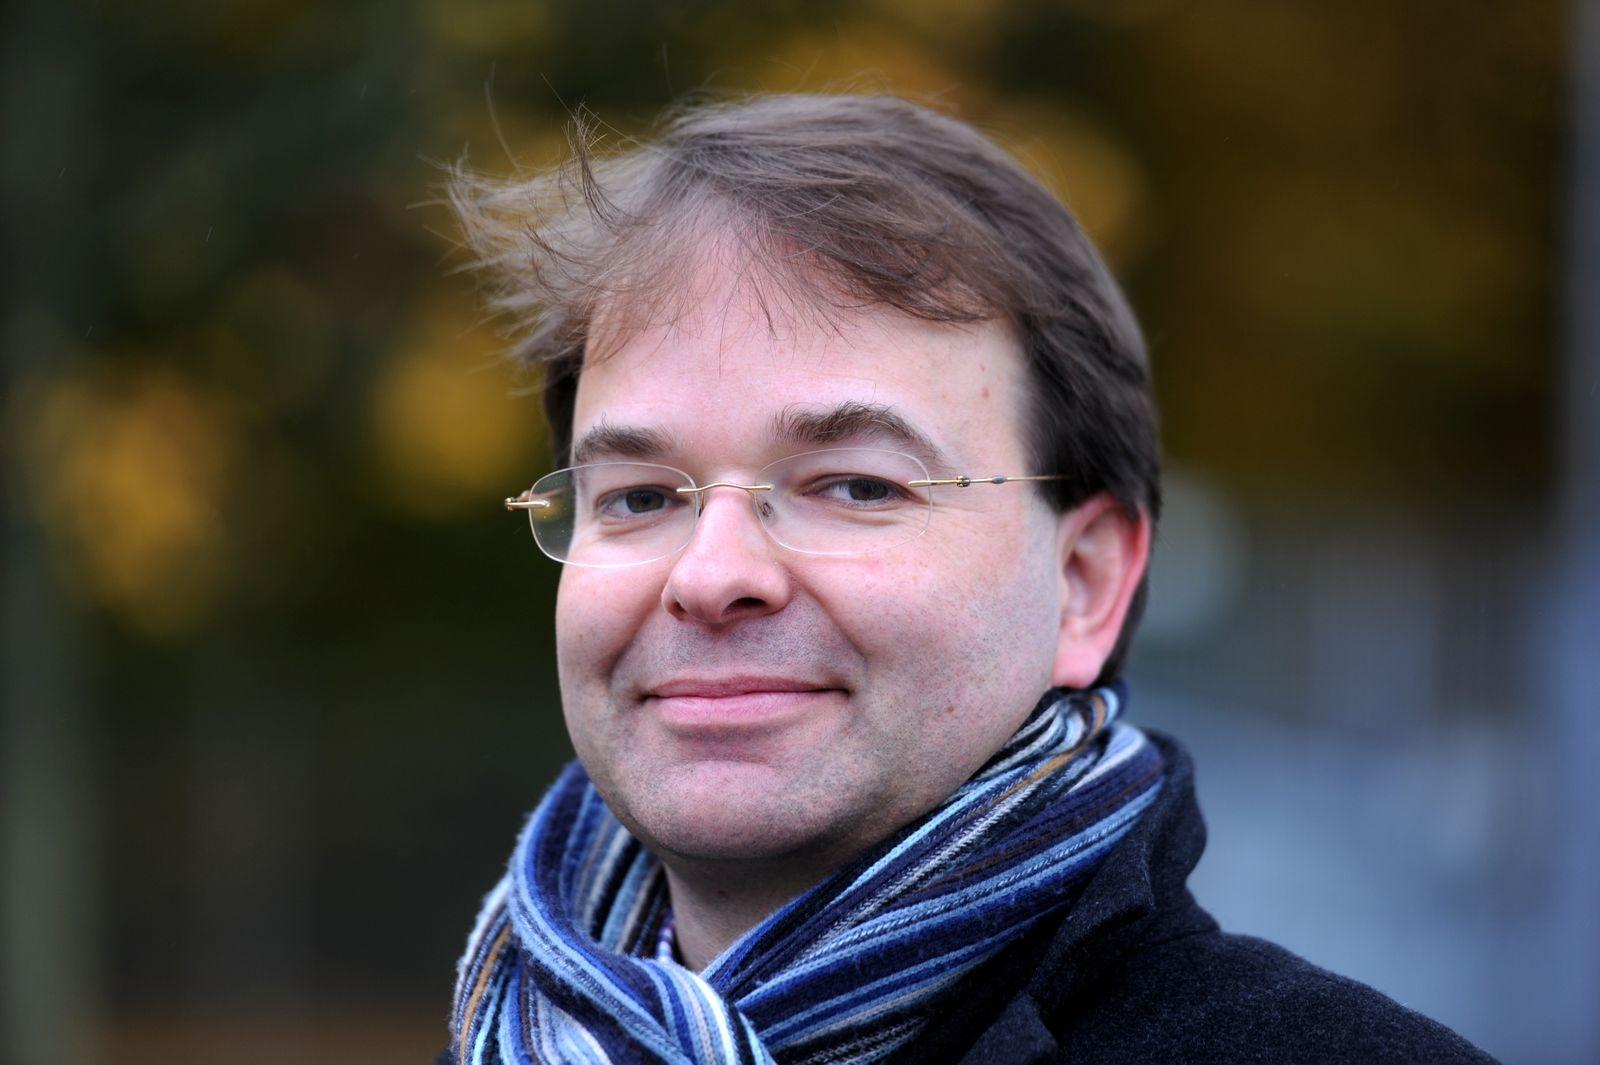 Krisenforscher Frank Roselieb